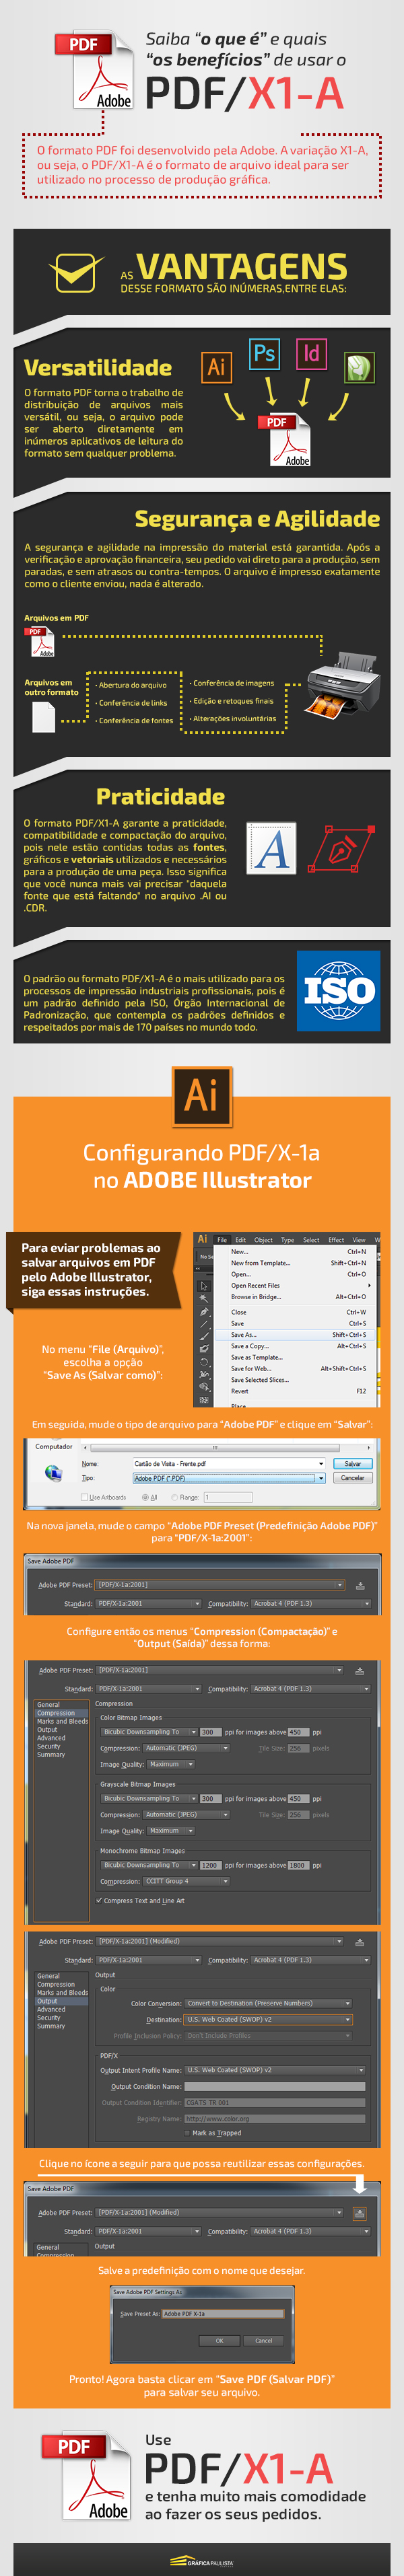 infográfico PDF - Illustrator